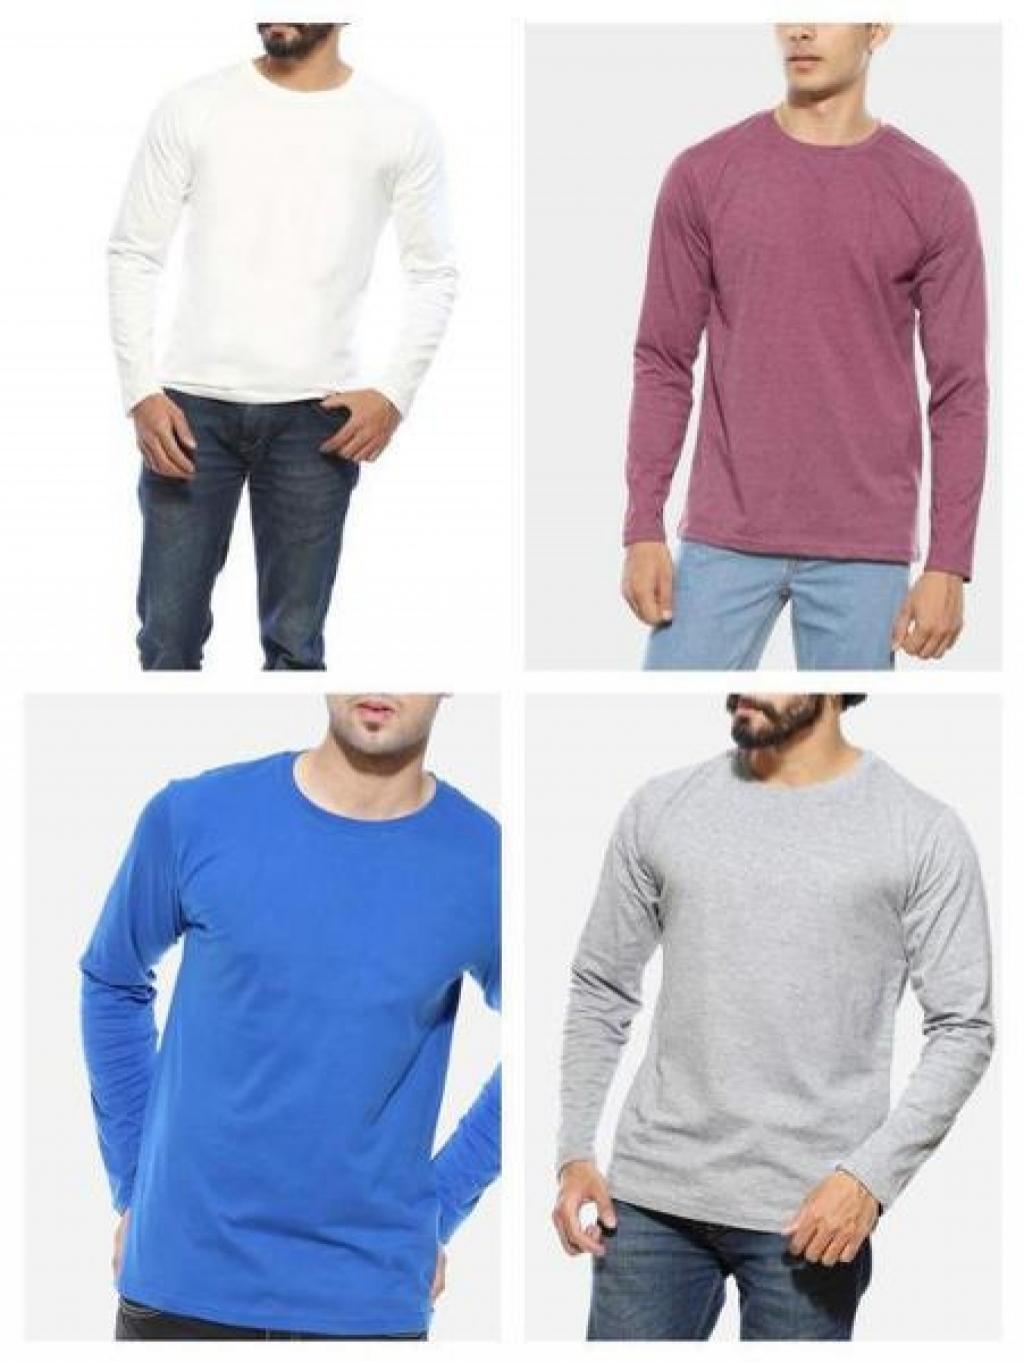 15426301940_virgin-teez-sweat-shirt-pack-of-4-full-sleeves-t-shirts-3706528333912_grande.jpg